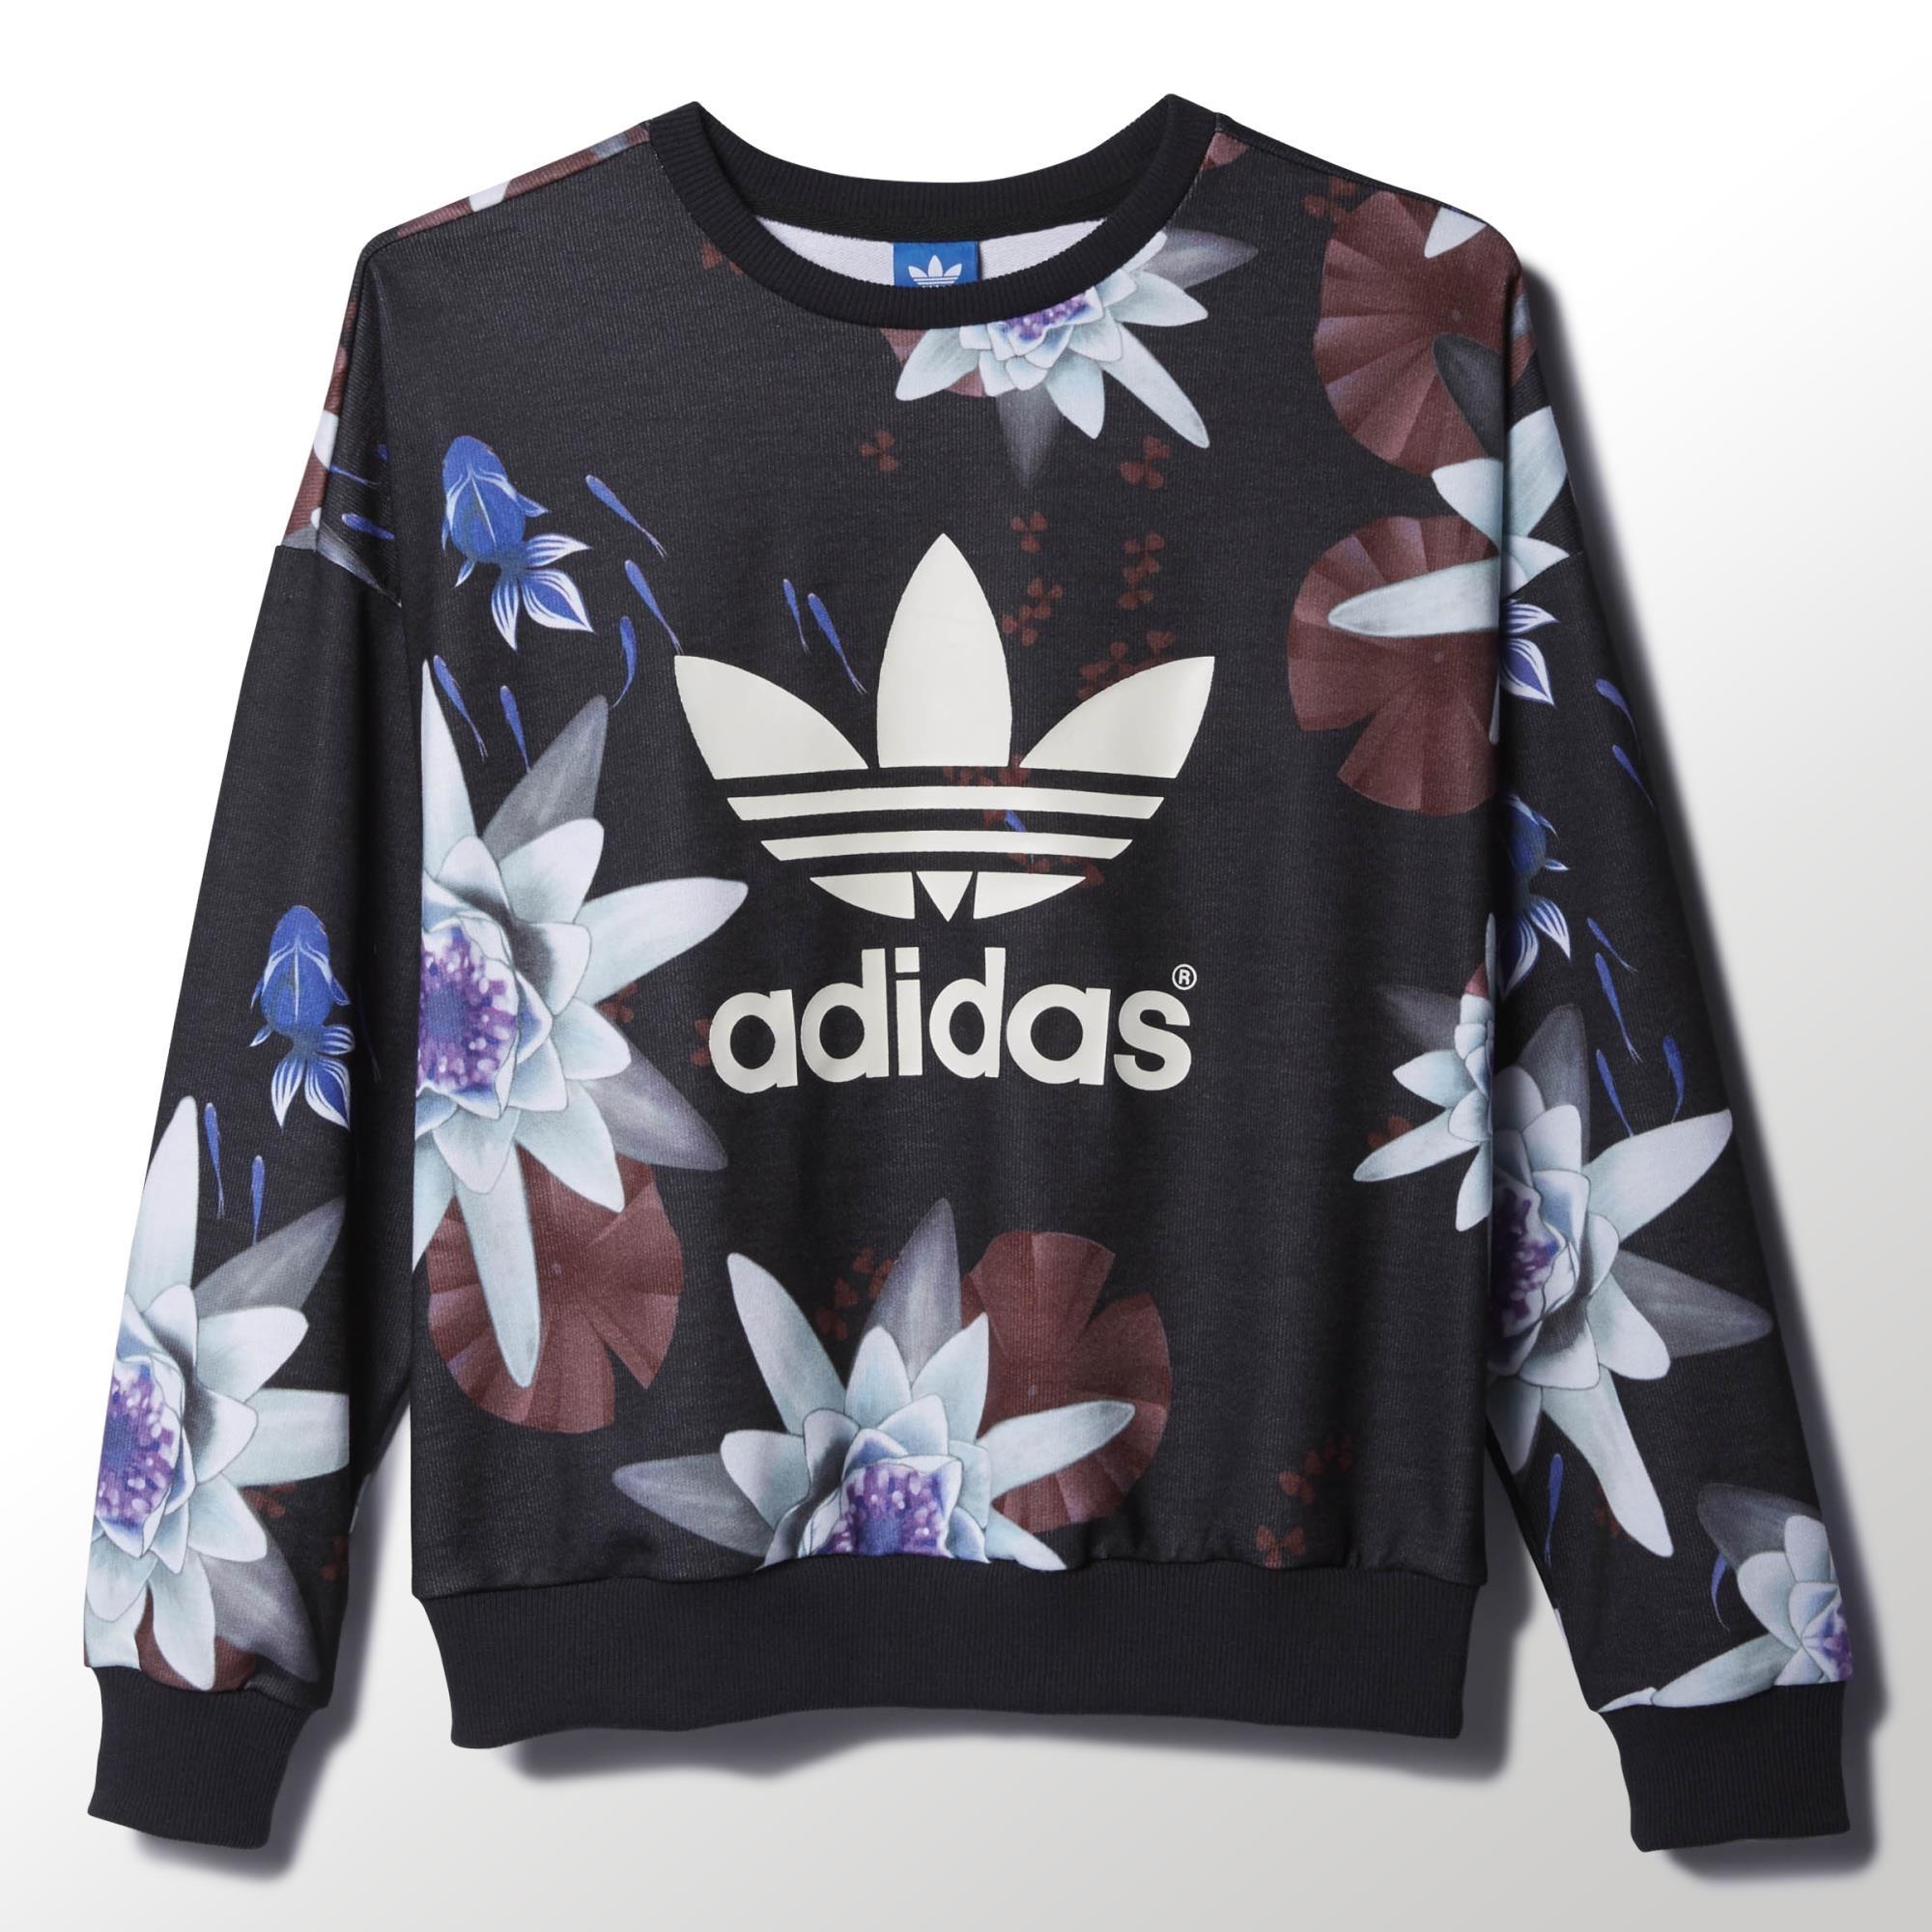 adidas lotus print sweatshirt adidas deutschland. Black Bedroom Furniture Sets. Home Design Ideas